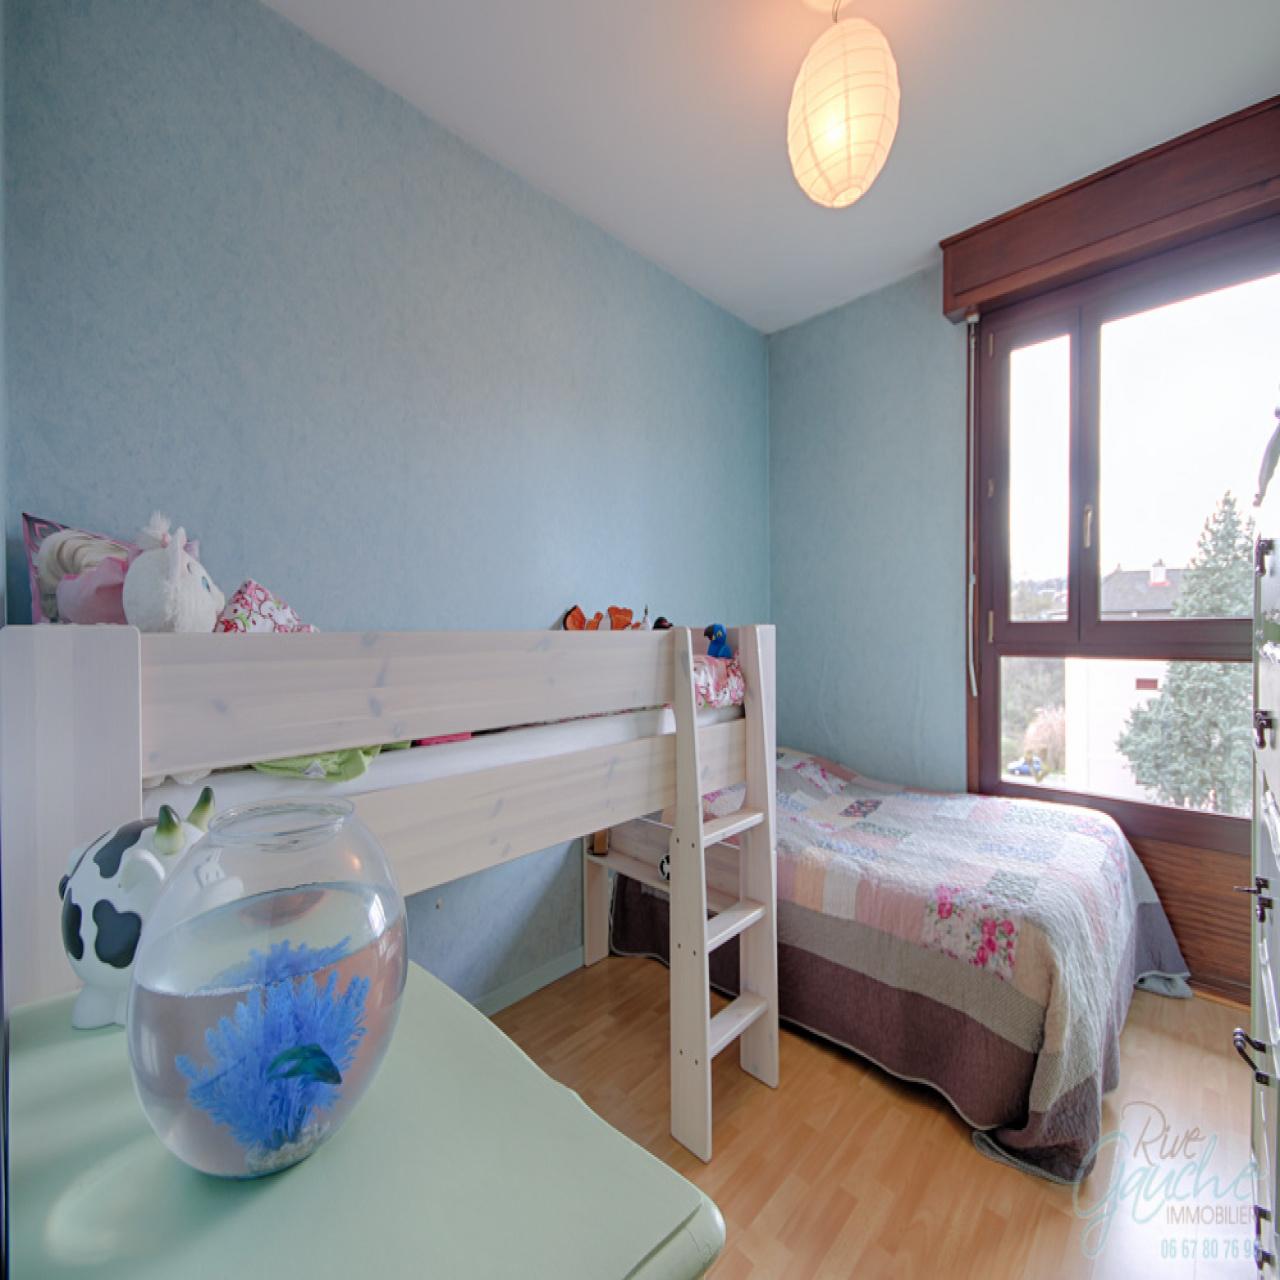 Image_5, Appartement, Meythet, ref :FI3195